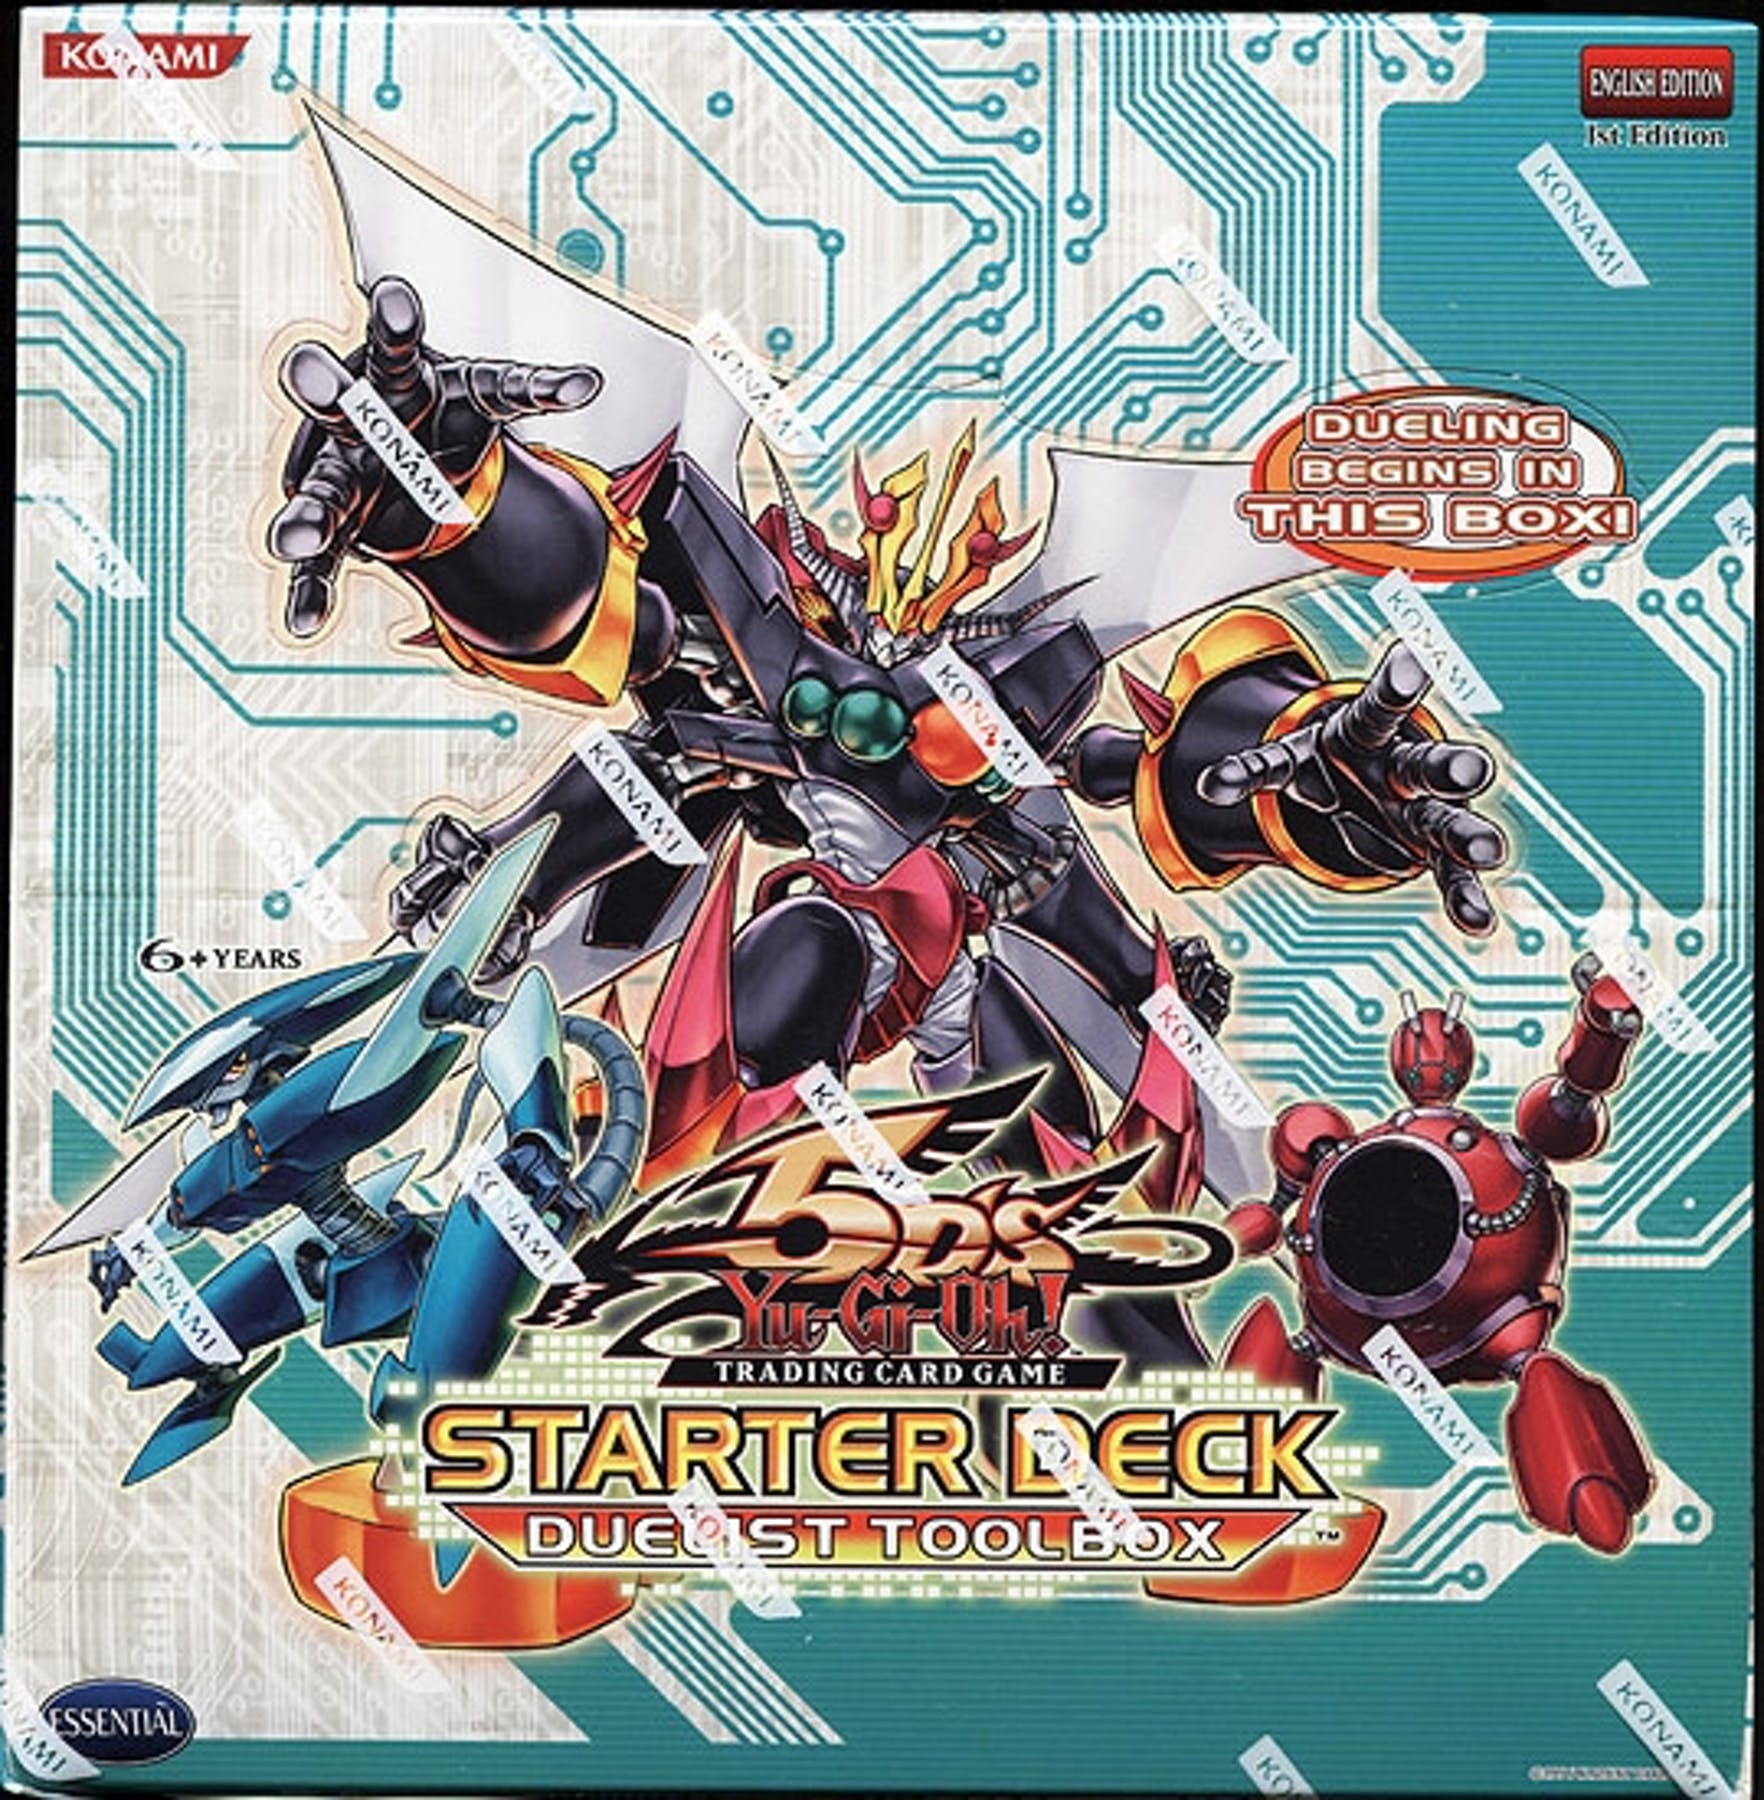 Yu-Gi-Oh 5D's Duelist Toolbox Starter Box (Konami)